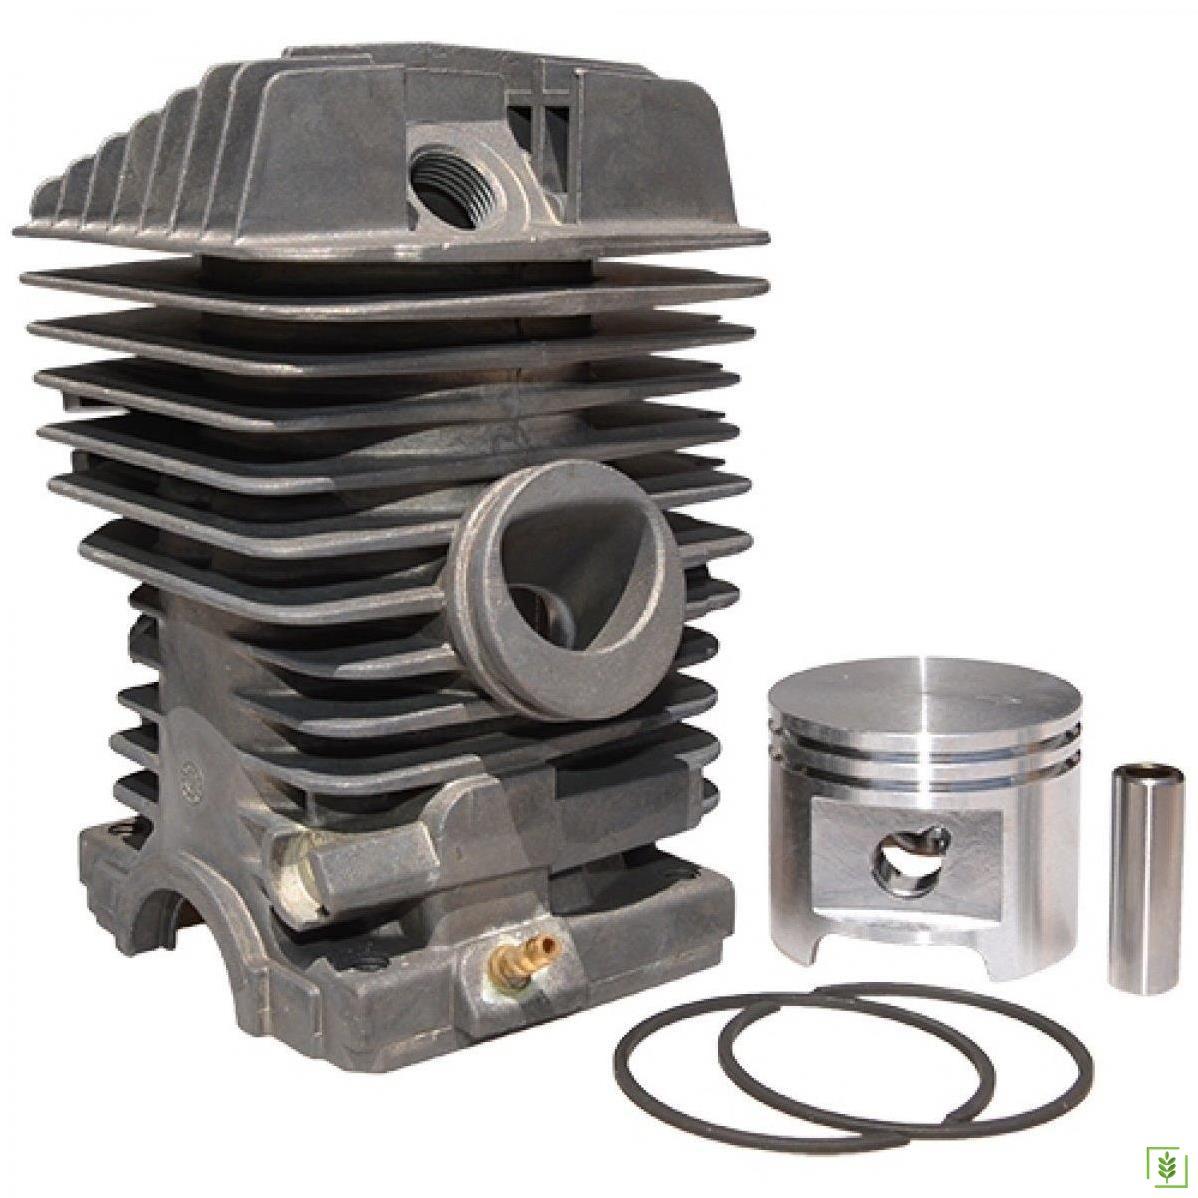 Stıhl MS 390-039 Silindir Piston Seti